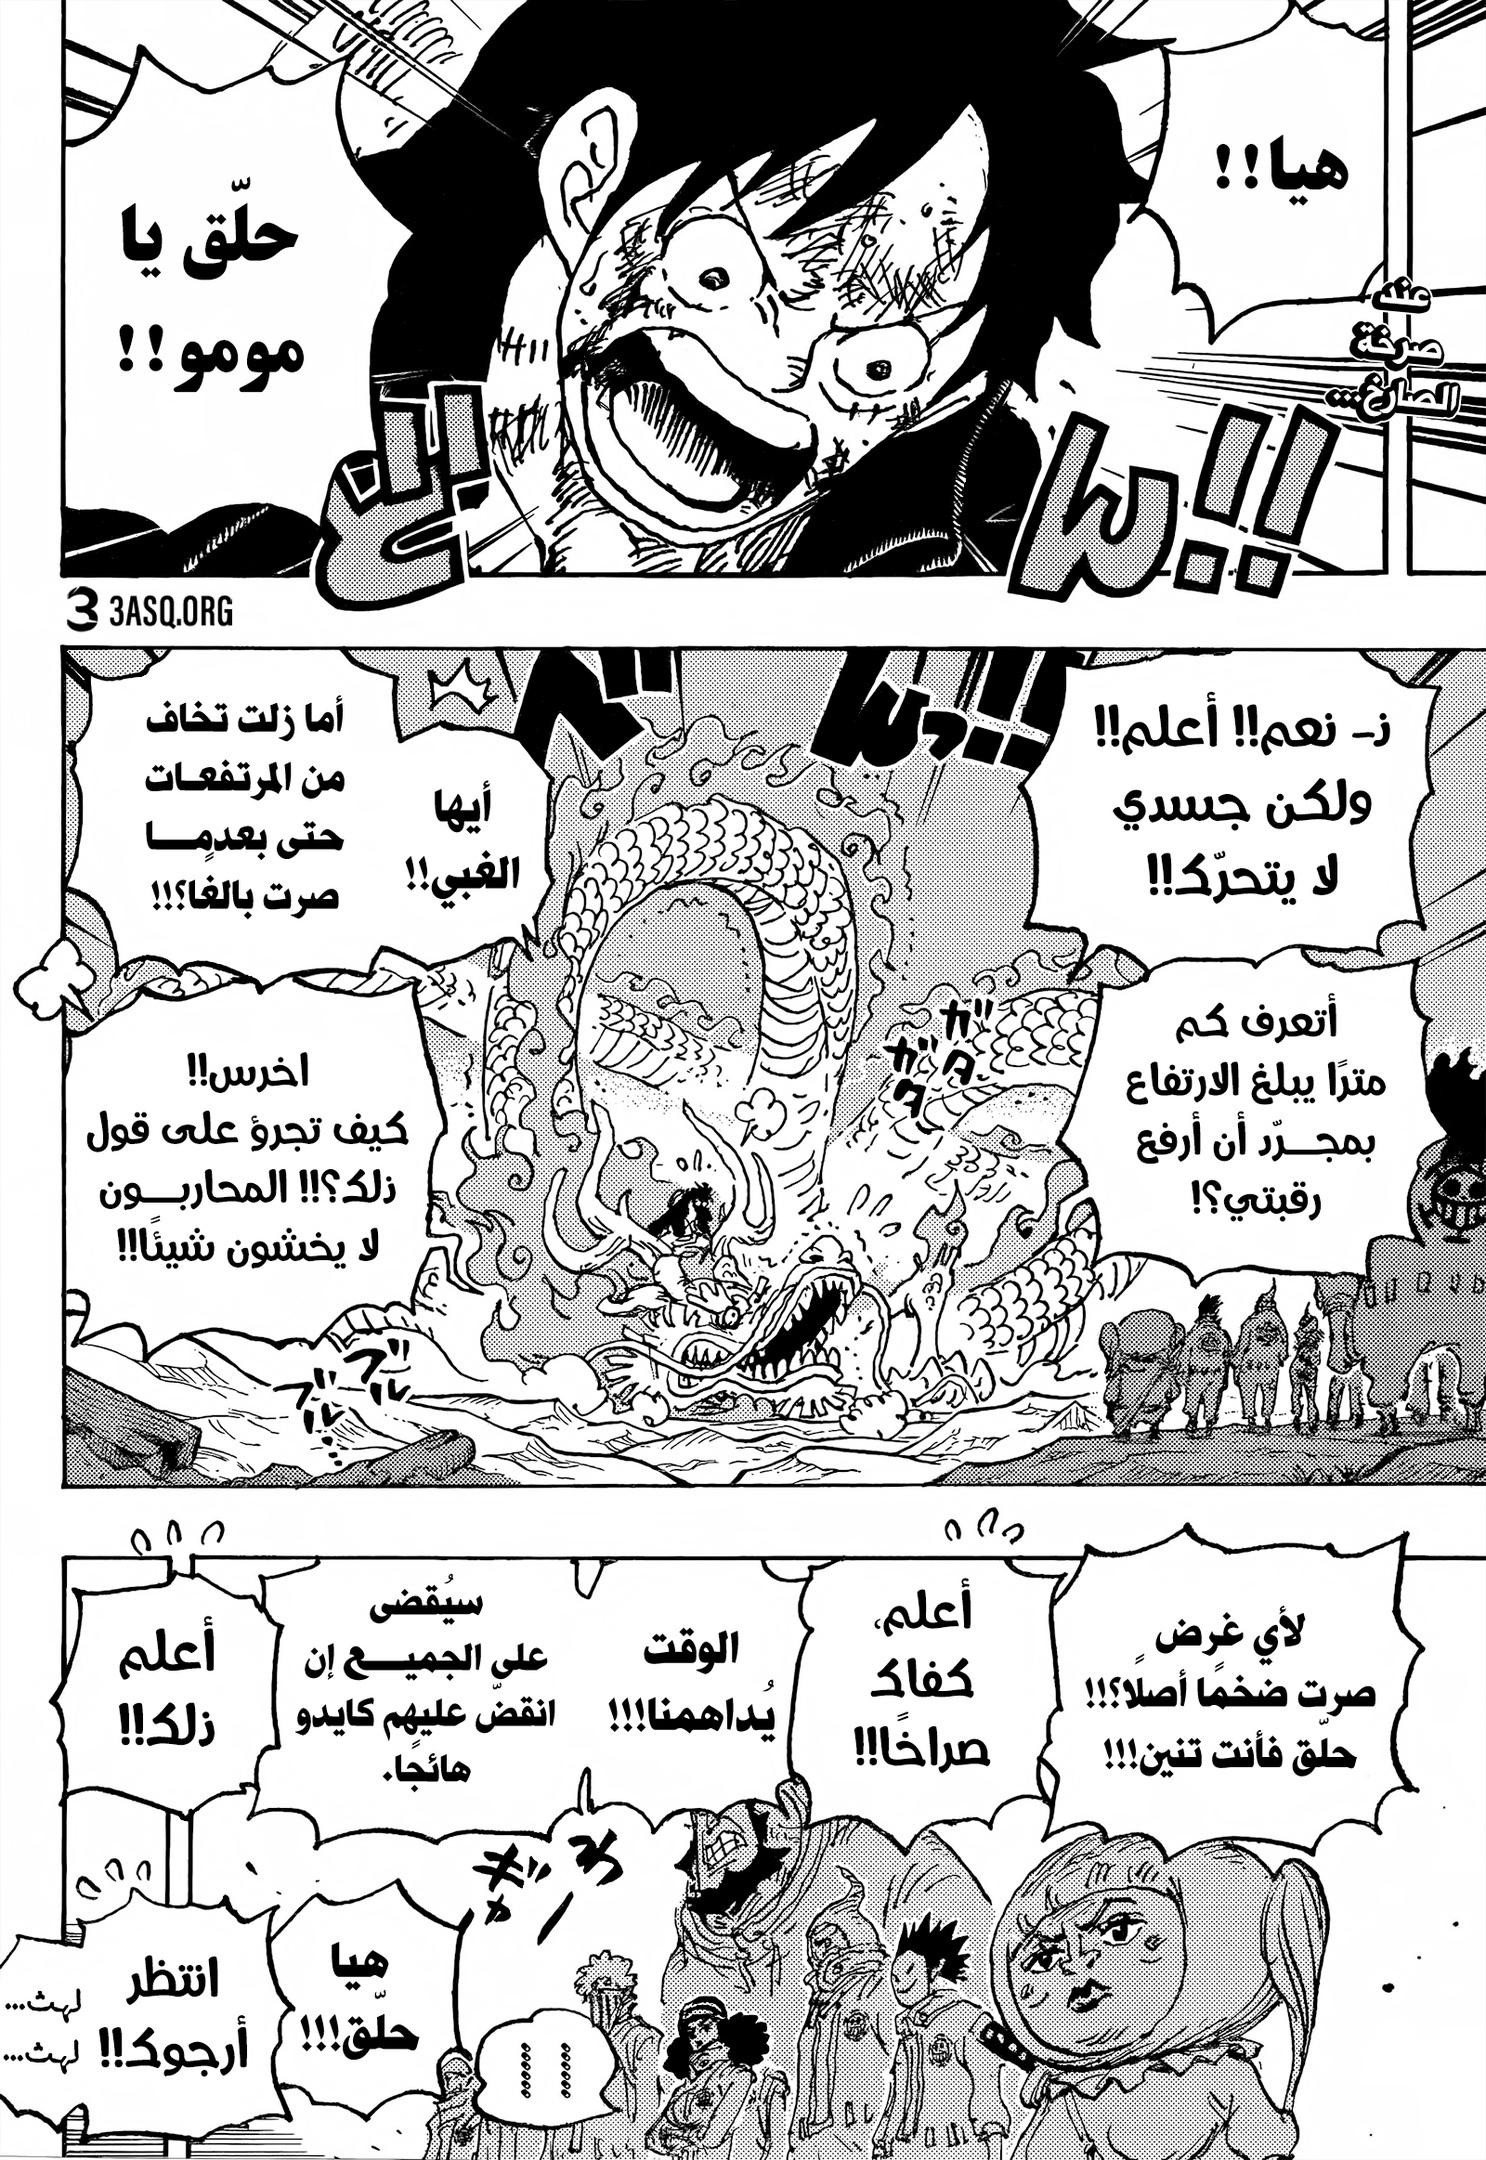 One Piece arab 1025, image №4